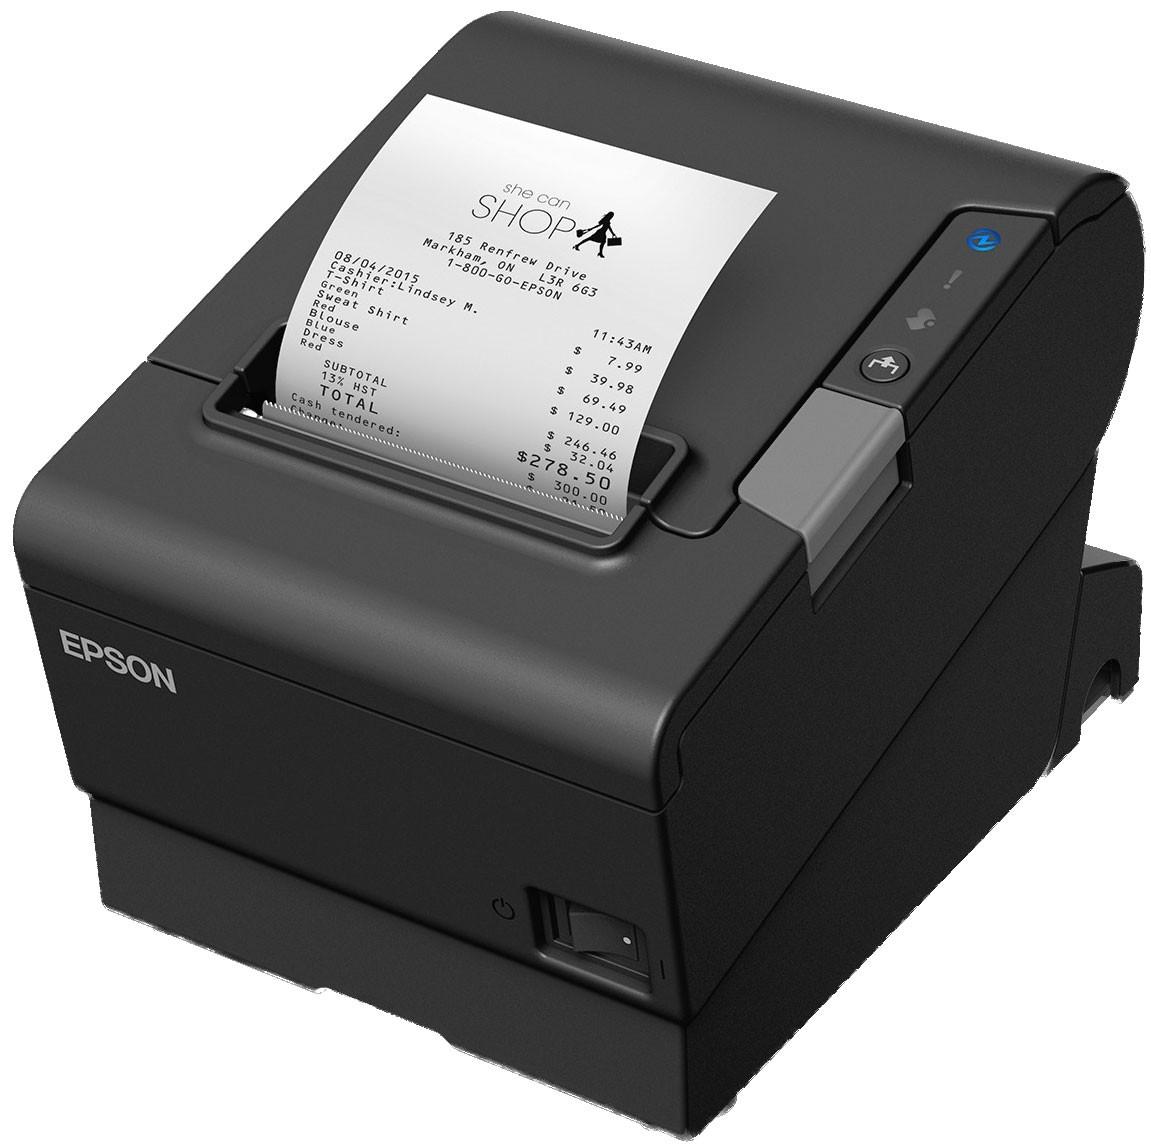 Epson TM-T88VI IDN Printer; black (TM886IG)